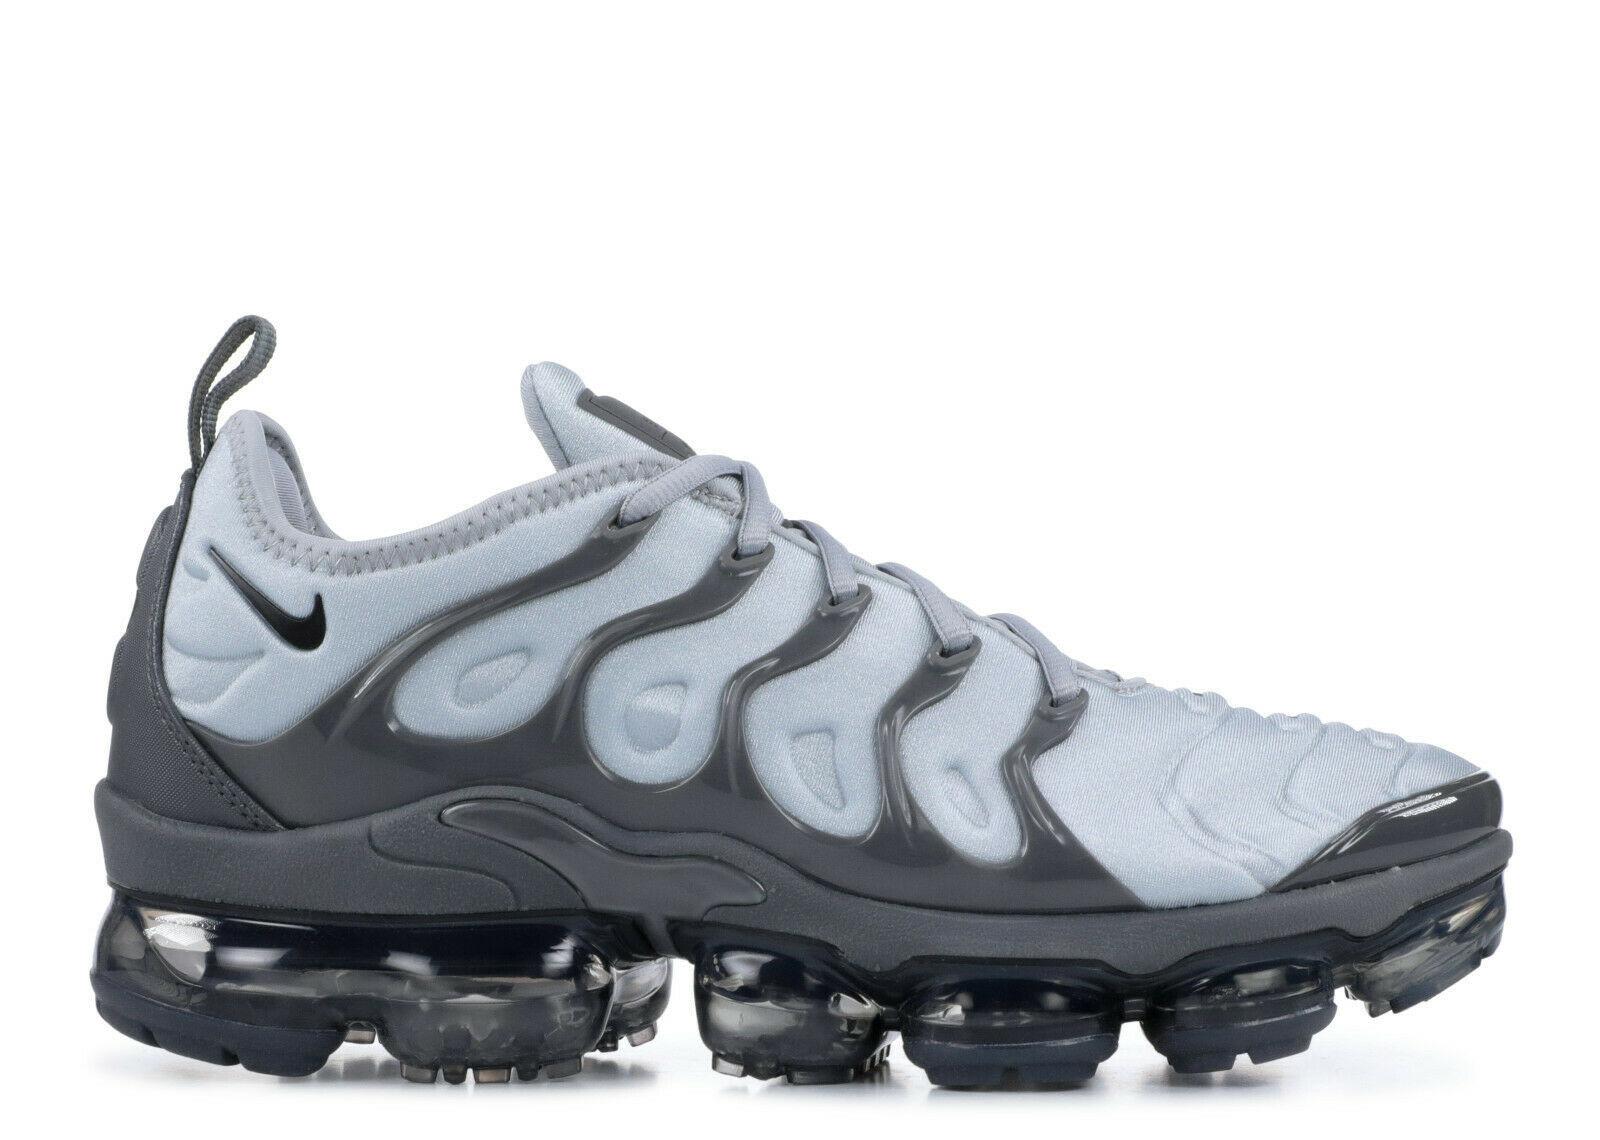 ab89a98a86 Air Vapormax Plus Men Shoes 924453-016 Wolf Grey/Black-Dark Grey Sneakers  Size 7 - $247.49